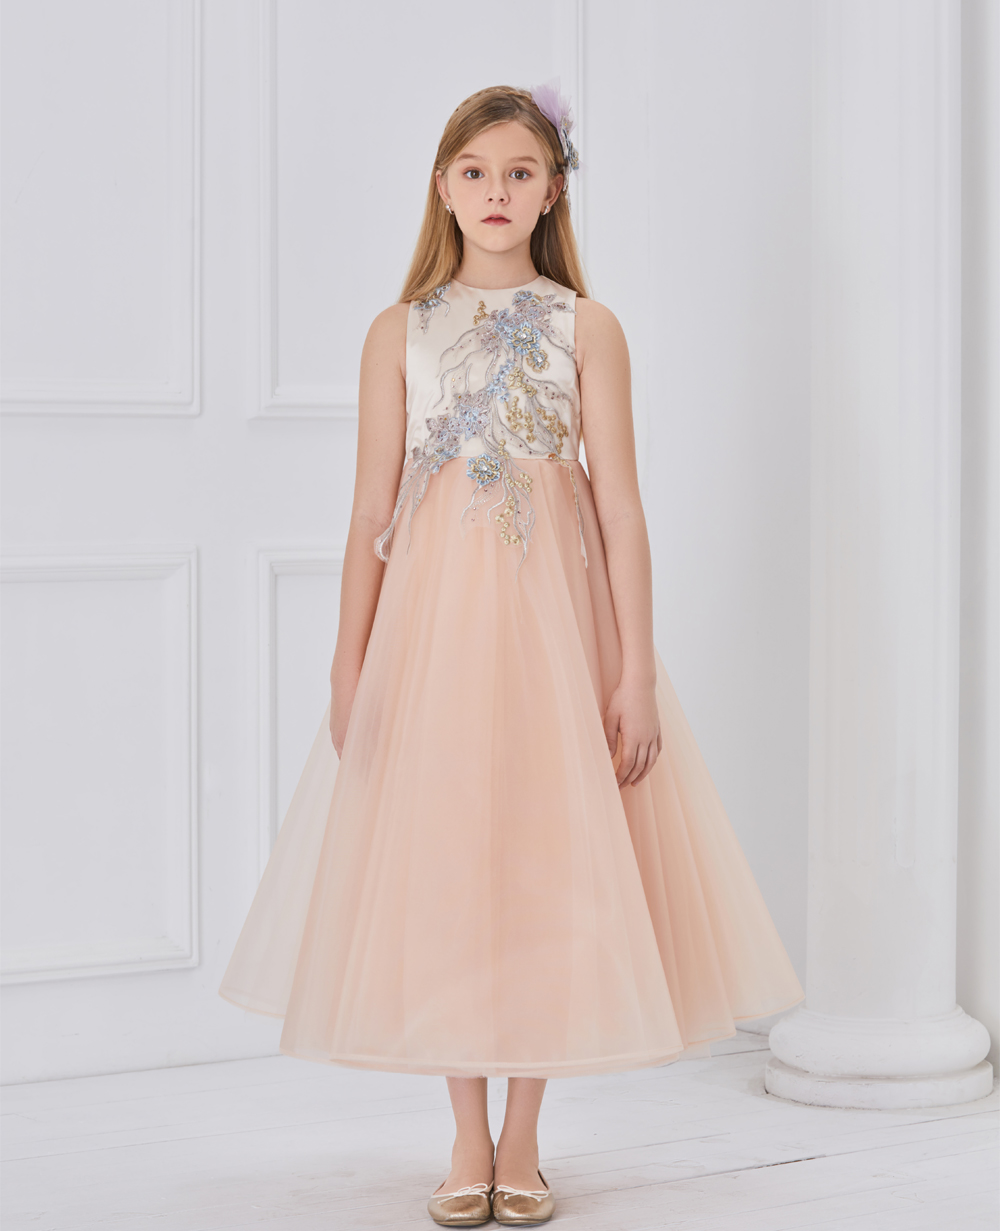 Princess Peach Sleeveless Tuelle Dress